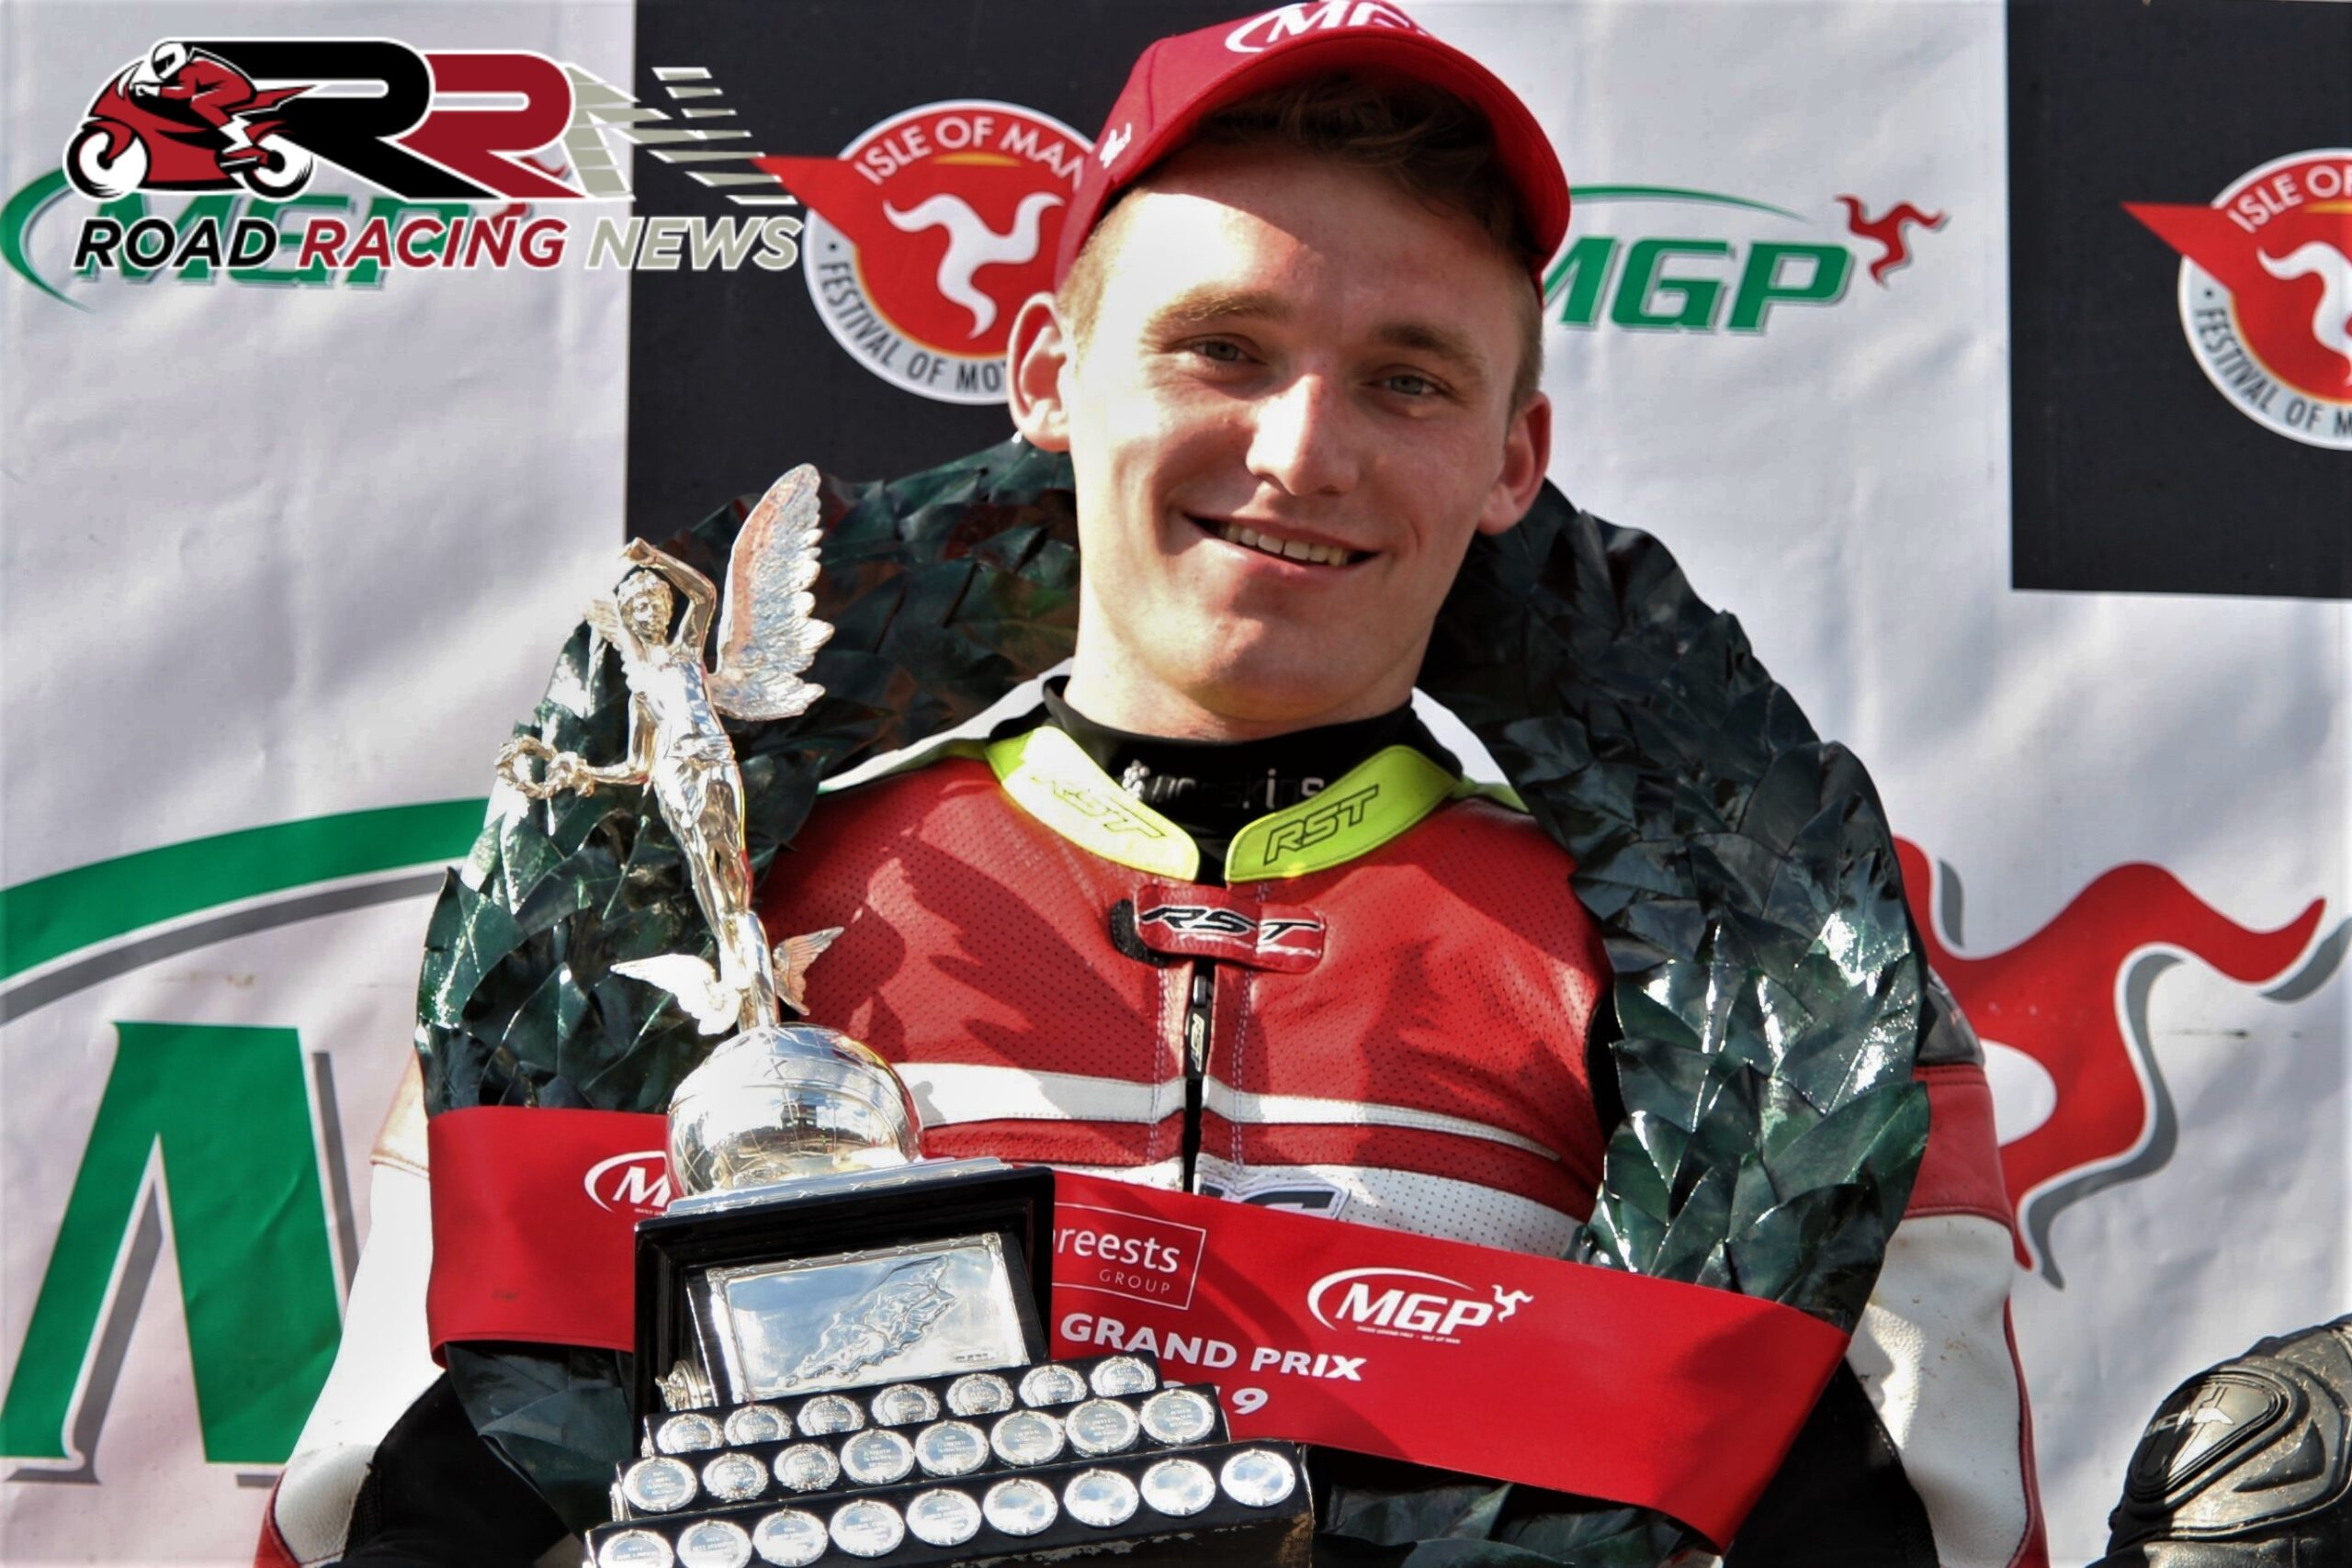 Harrison Overcomes Pit Lane Speeding Penalty To Win Mylchreests Group Junior Manx Grand Prix